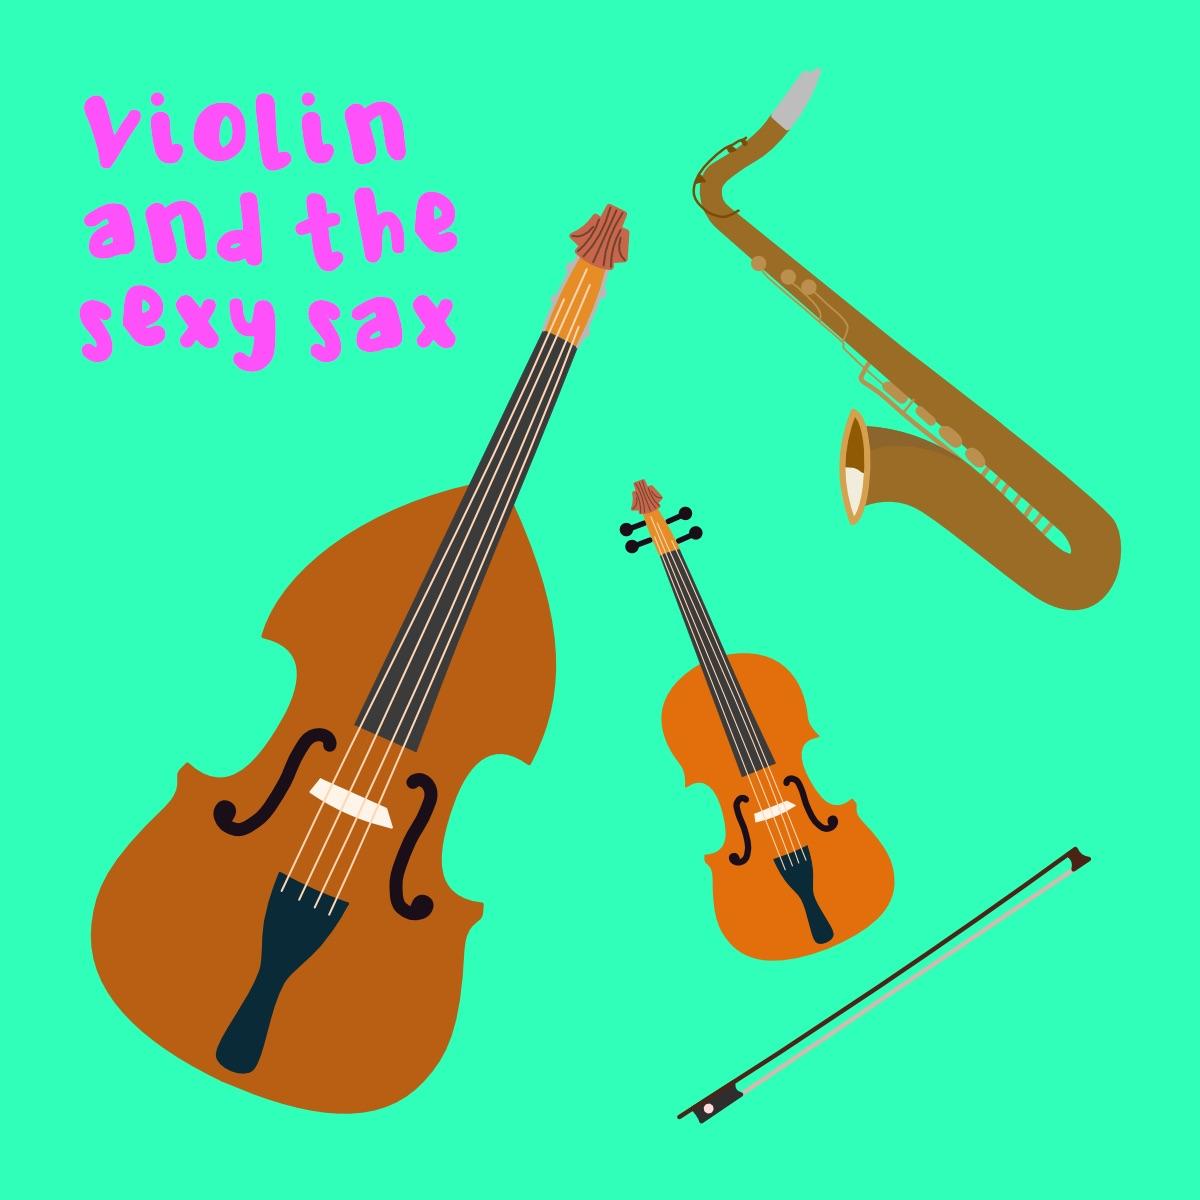 Violin and the Sexy Sax